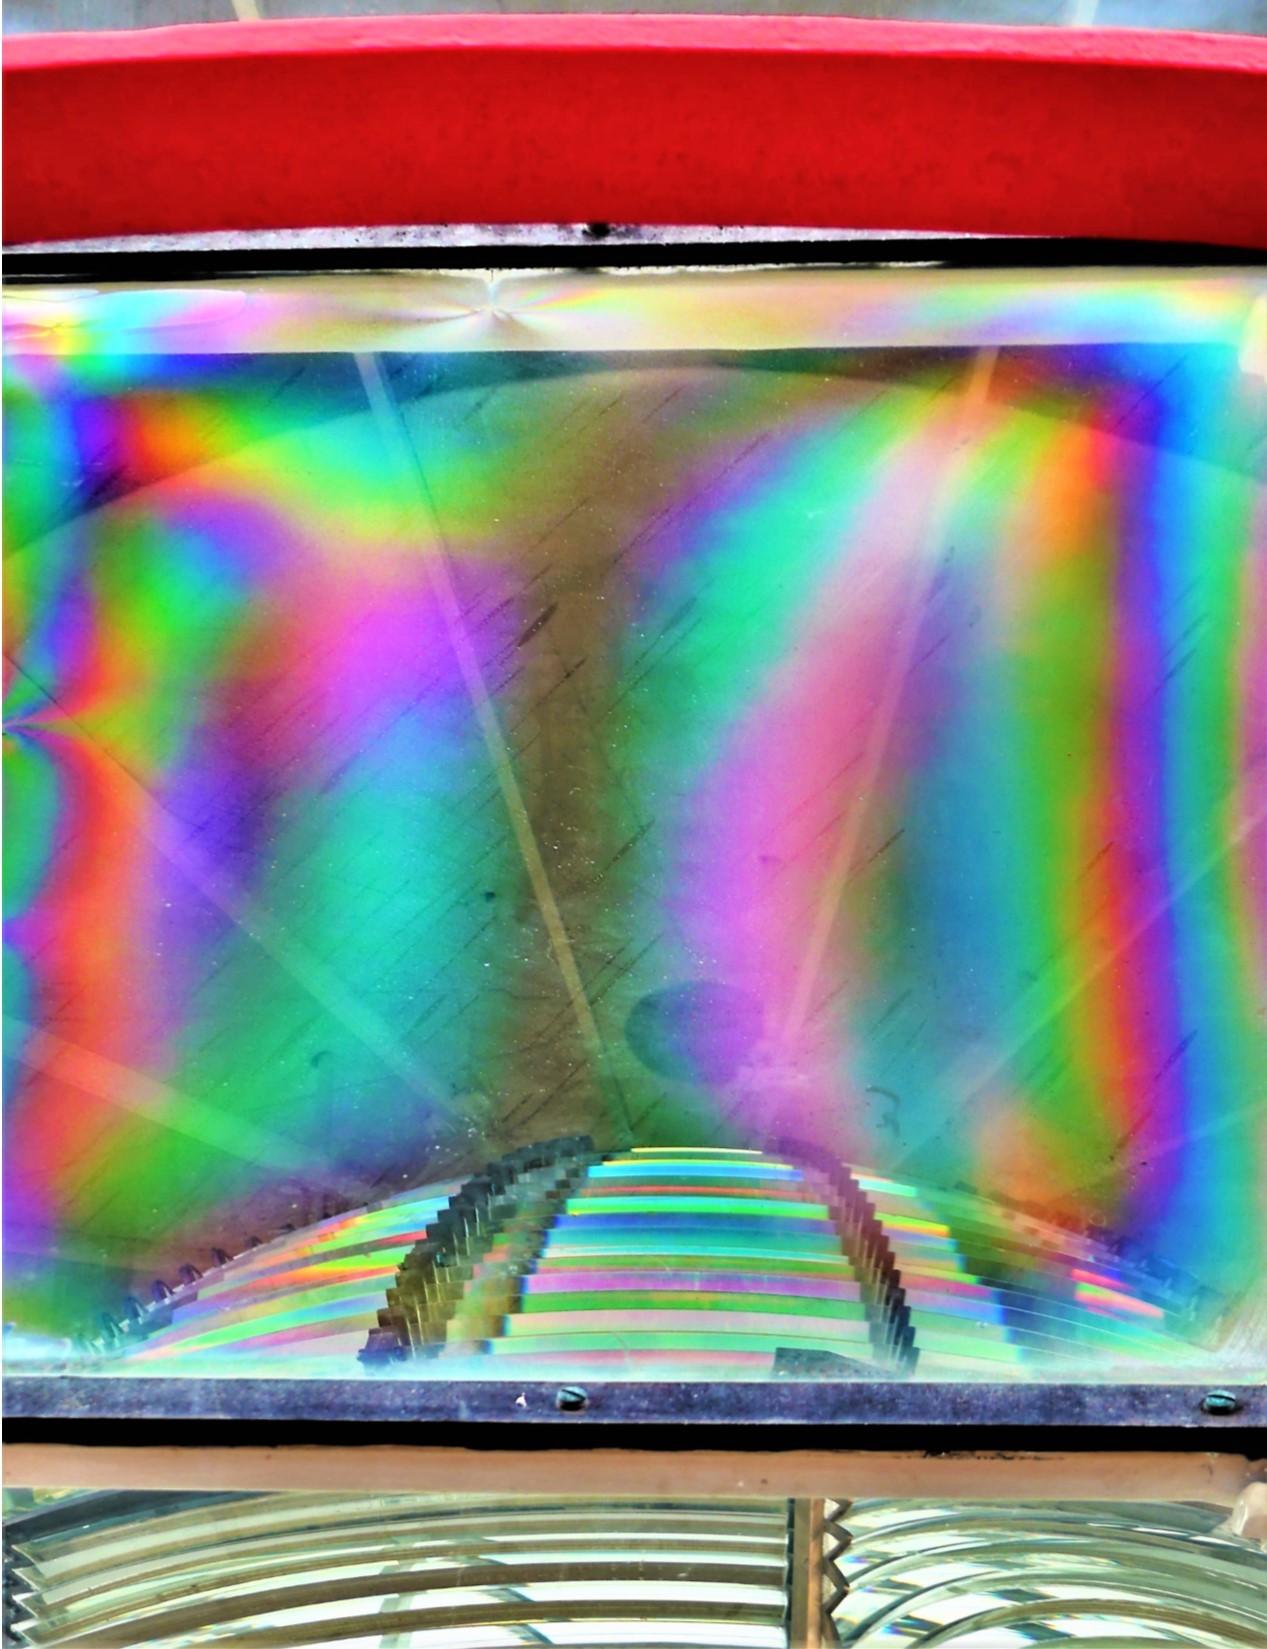 difraction close-up (2)